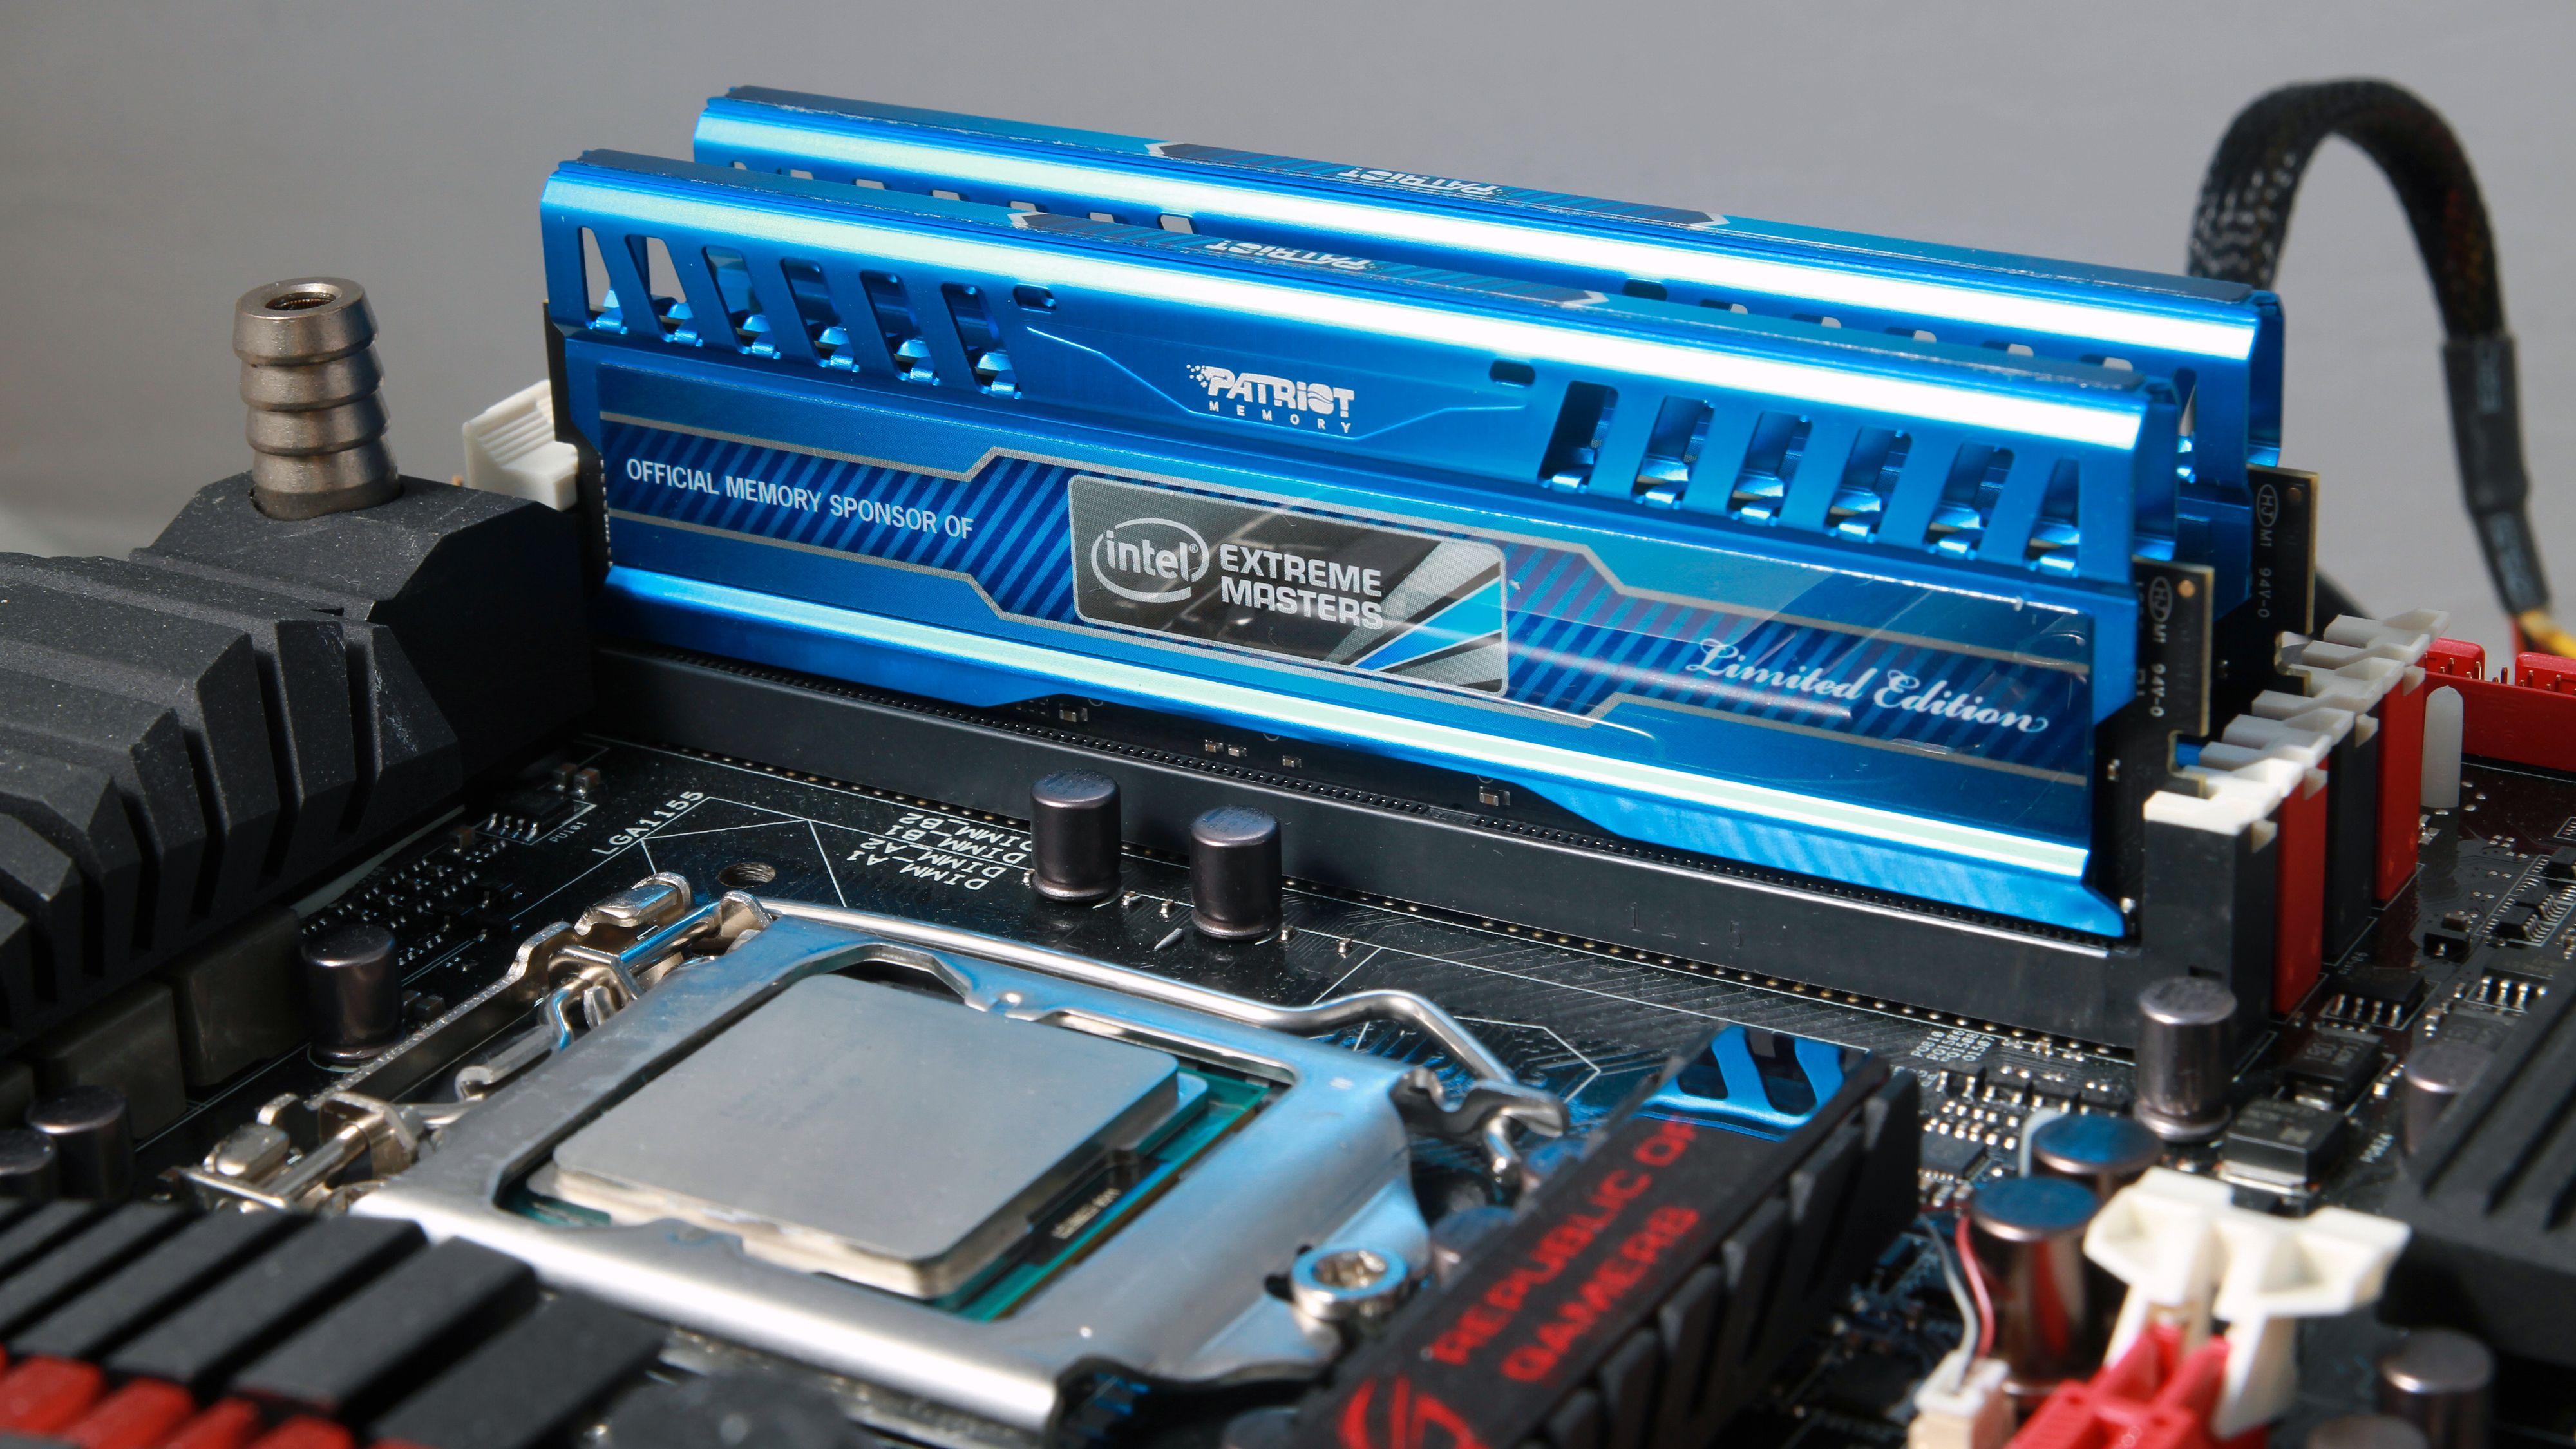 Patriot Intel Extreme Masters 2 x 8 GB 1866 MHz